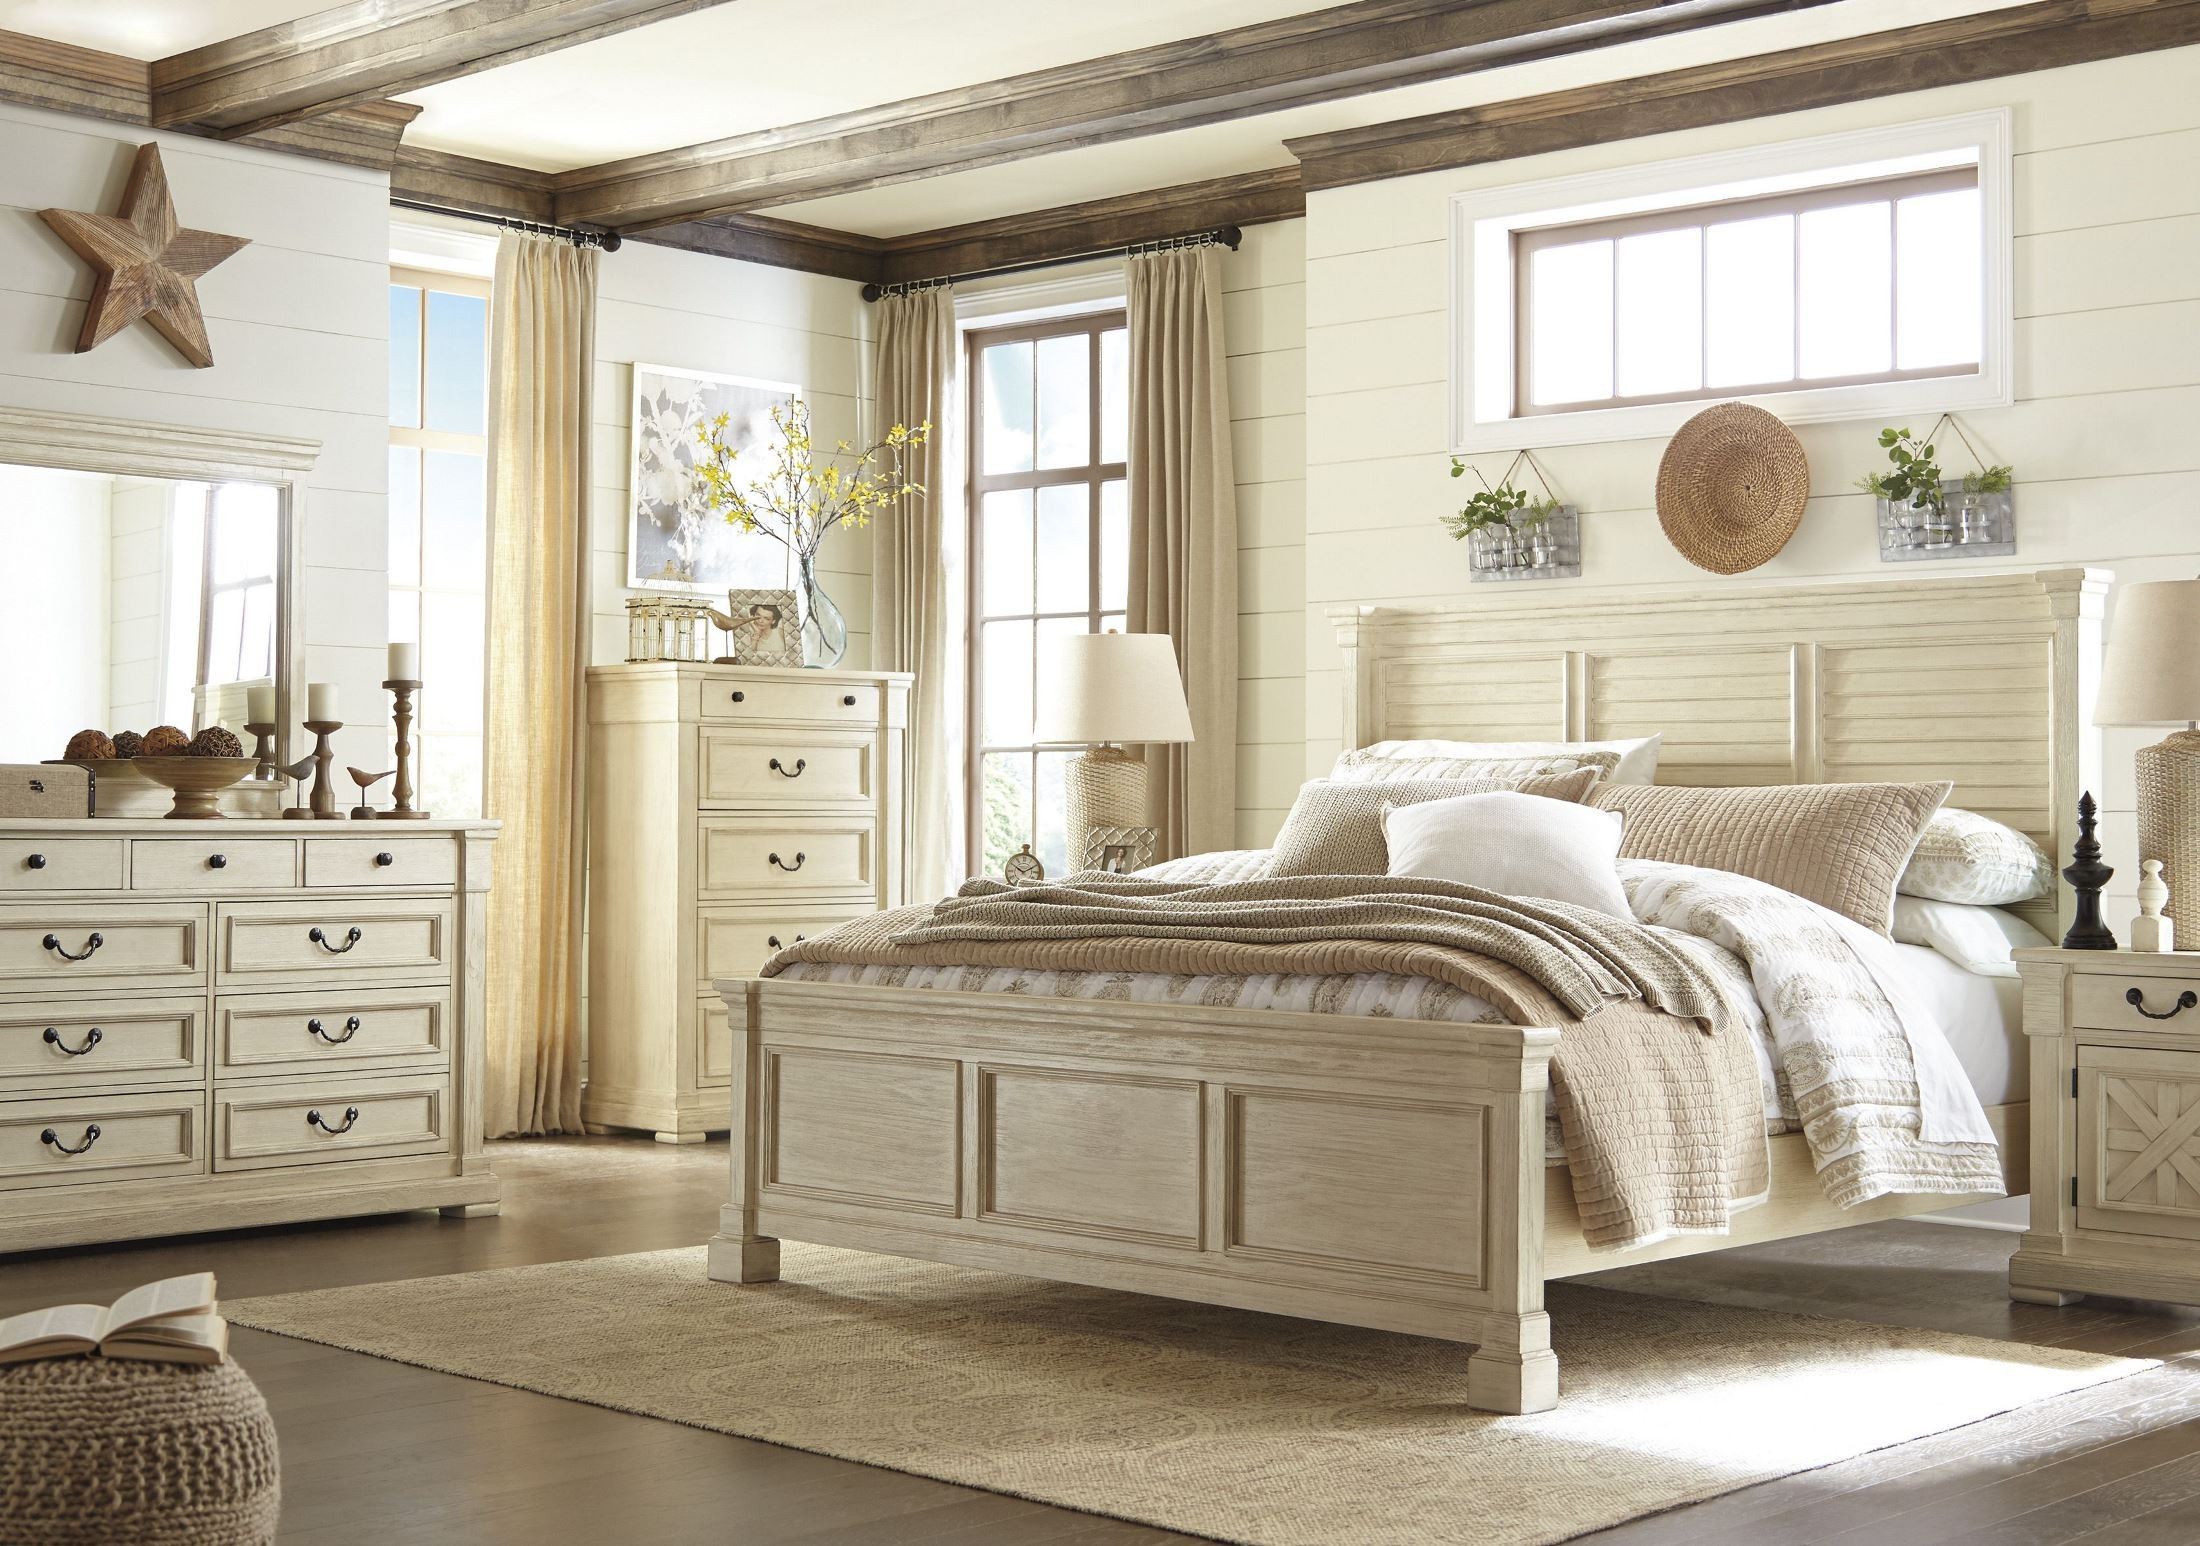 Bolanburg White Panel Bedroom Set, B647-54-57-96, Ashley